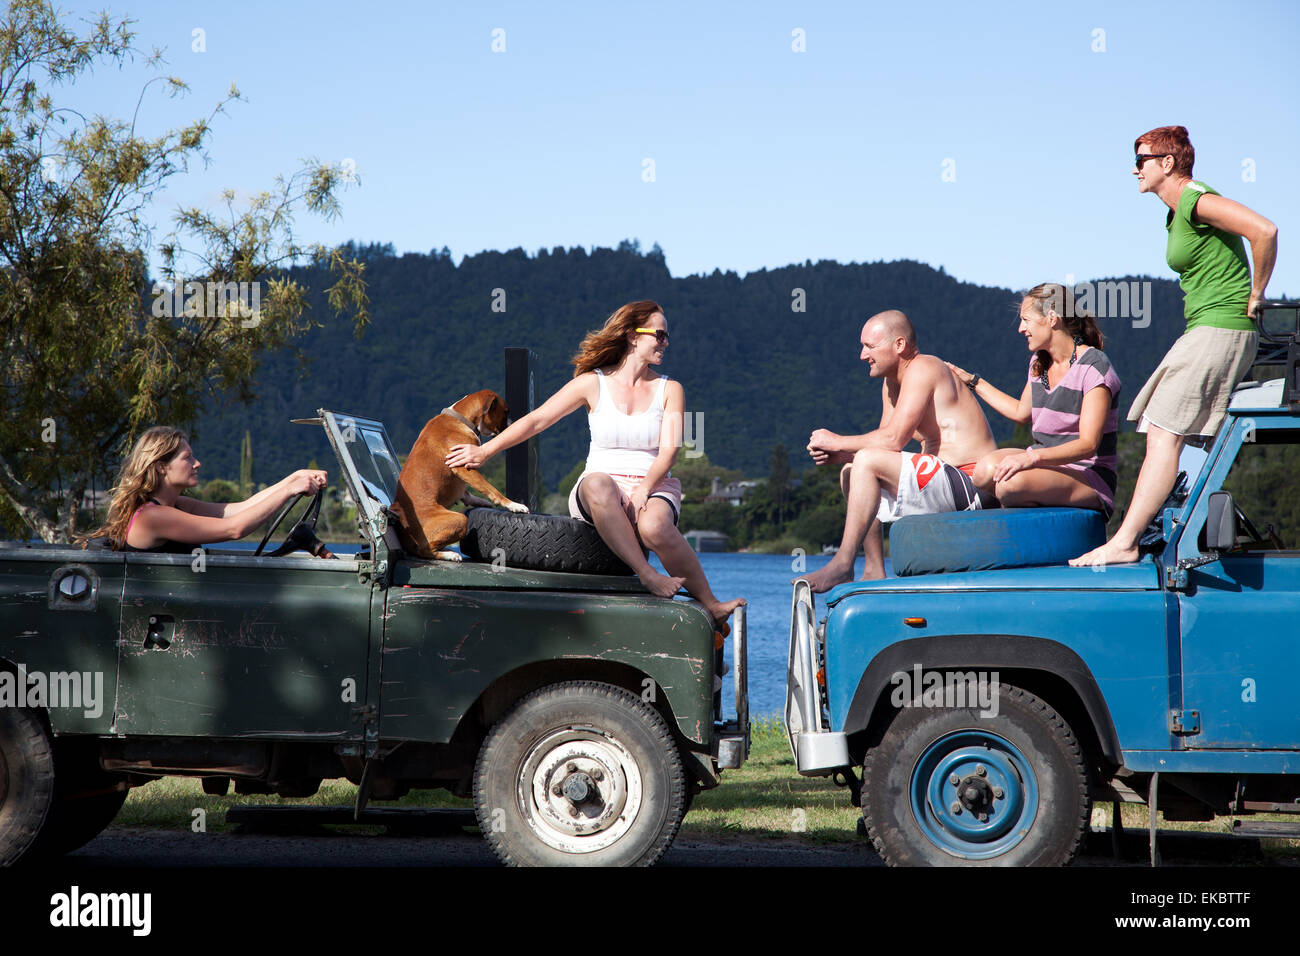 Adult friends chatting on top of off road vehicles, Lake Okareka, New Zealand - Stock Image